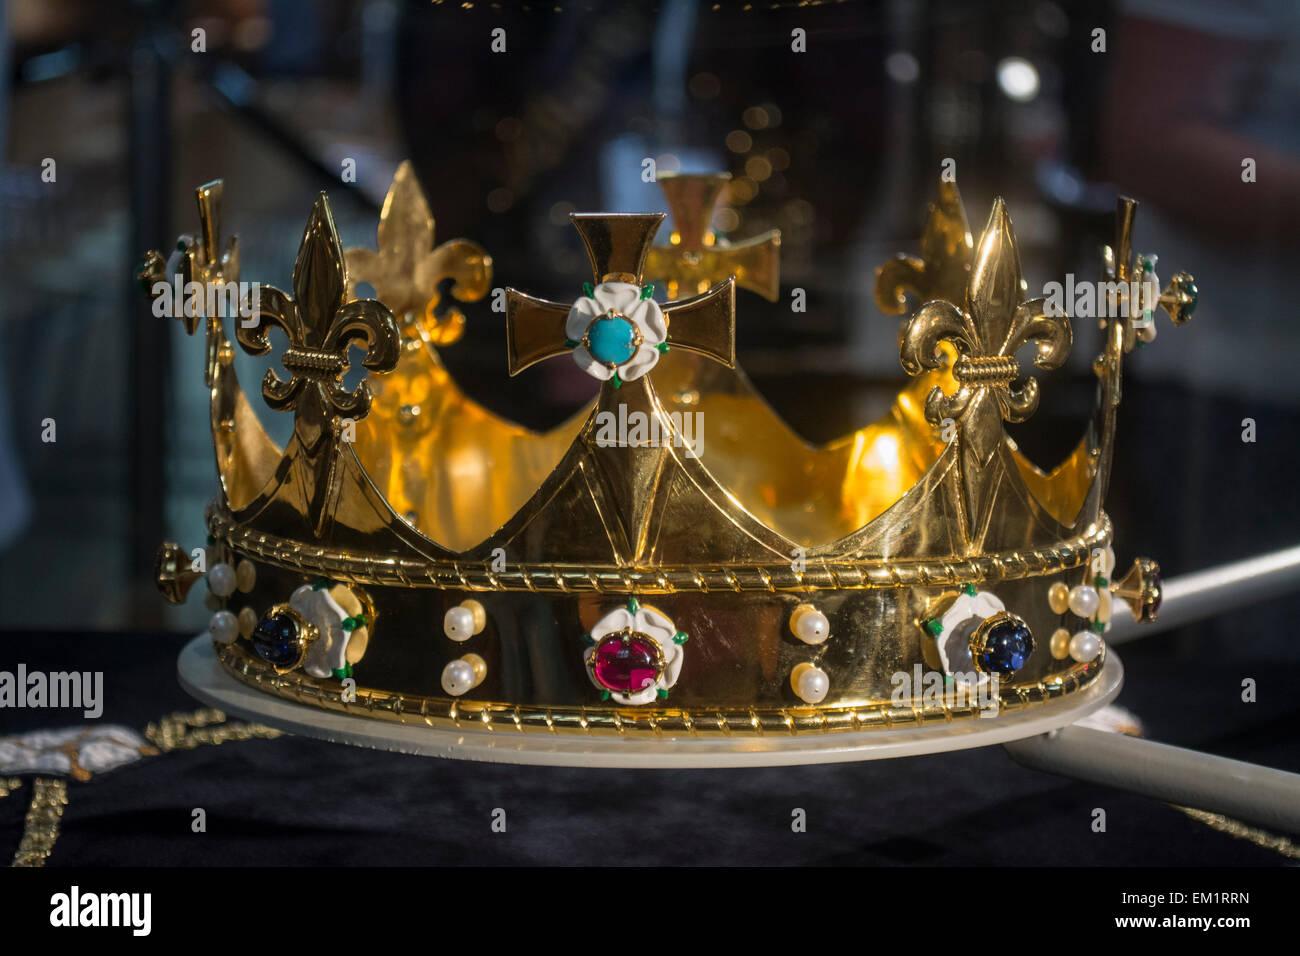 Krone England